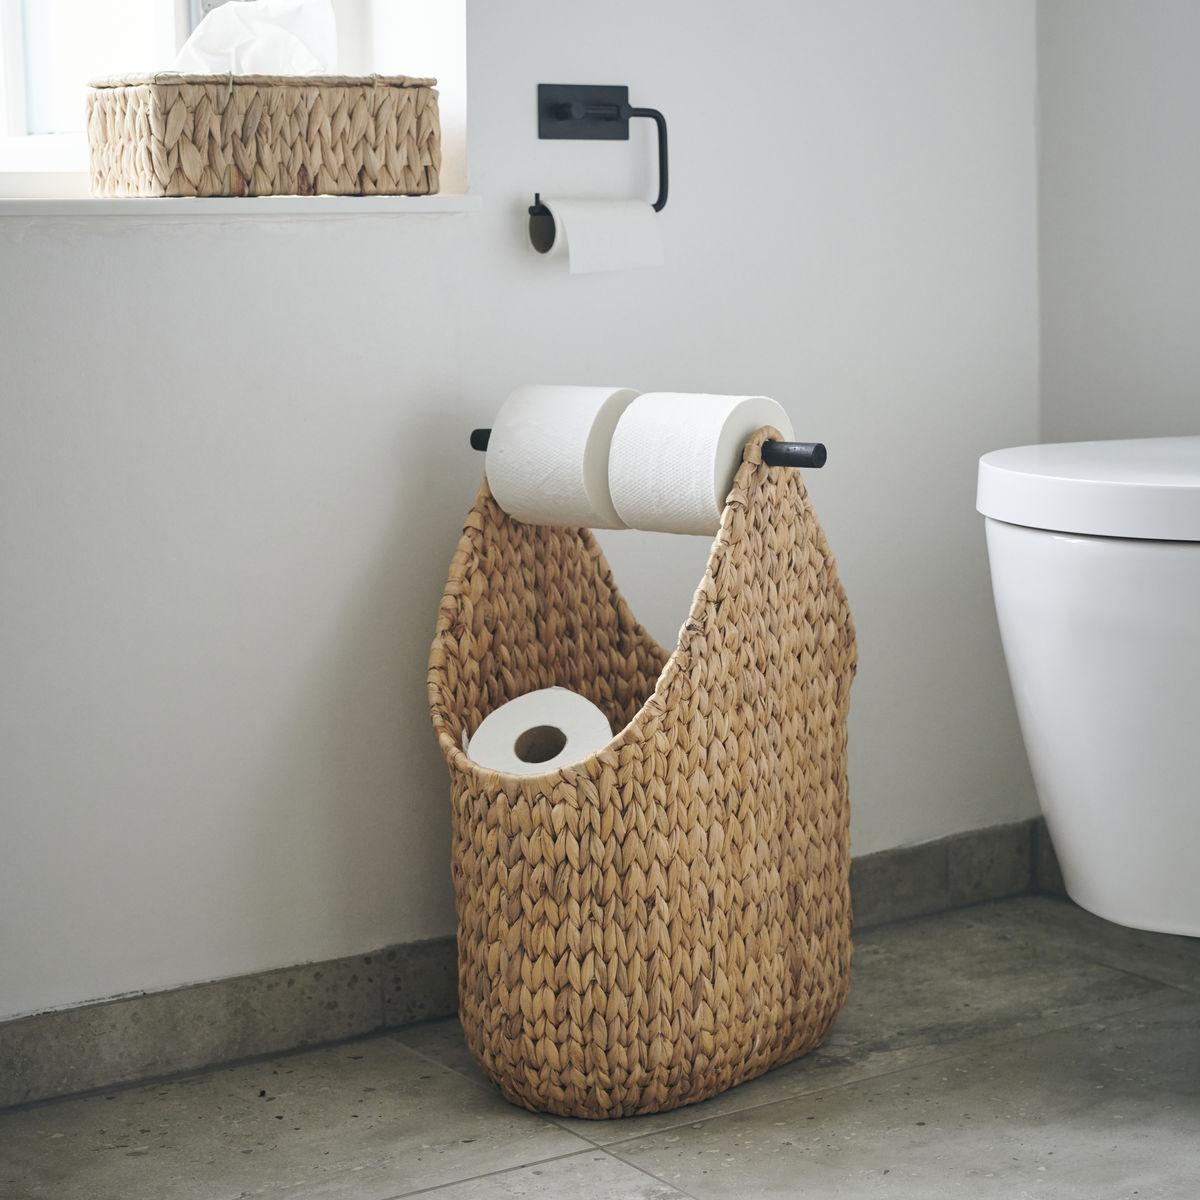 Cesta Portarollos Paper - jacinto -bano - papel higienico - House Doctor - Liderlamp (4)